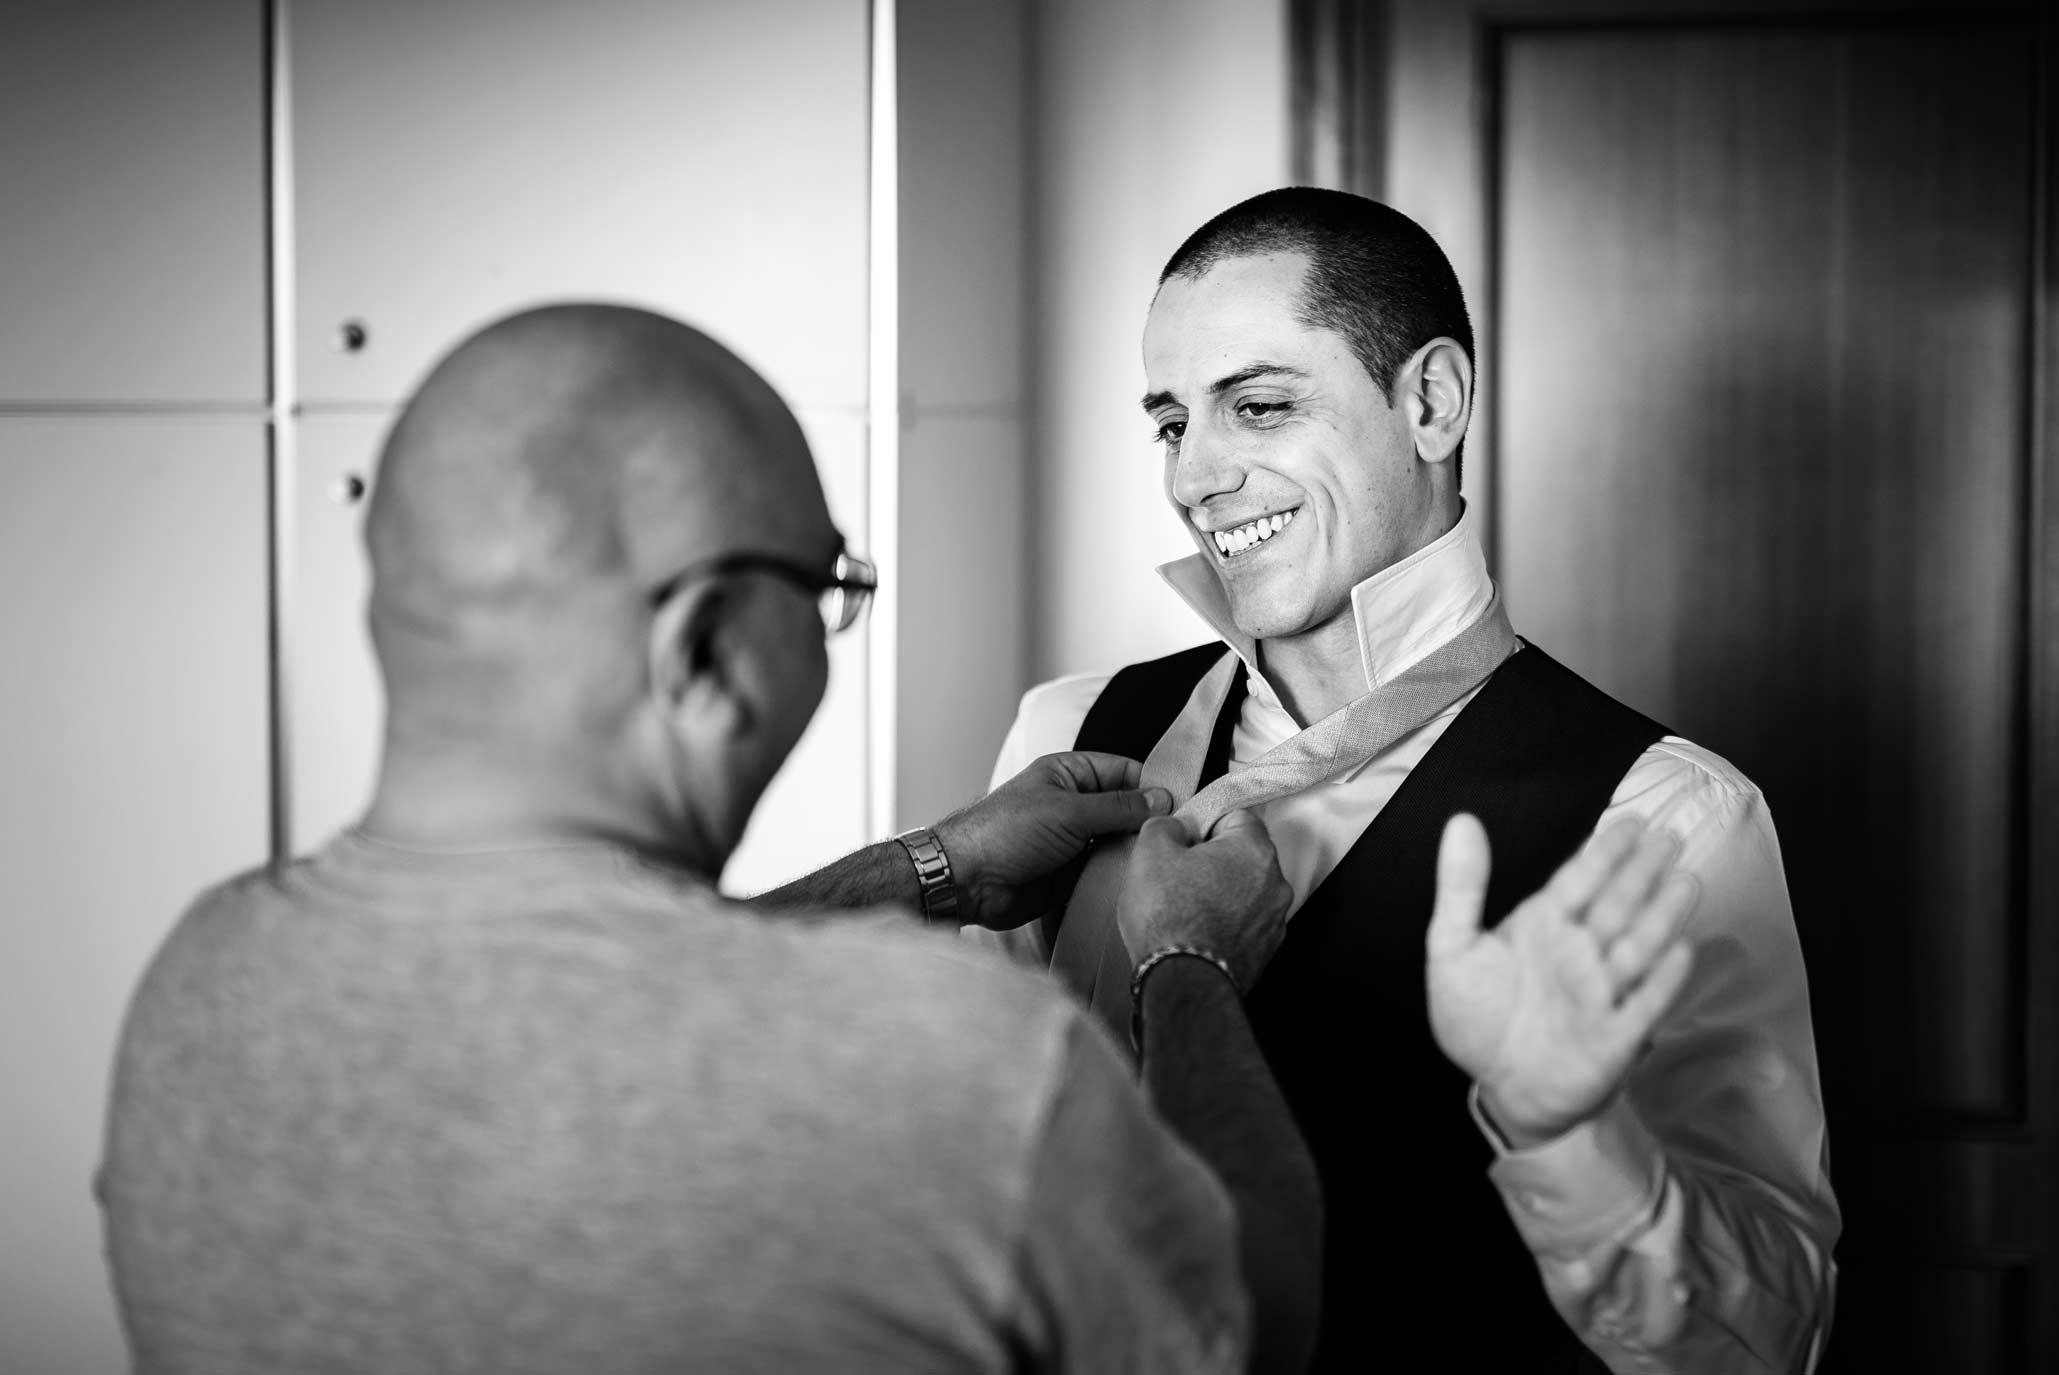 Fotoreportage-Matrimonio-Roma-Preparativi-Sposo